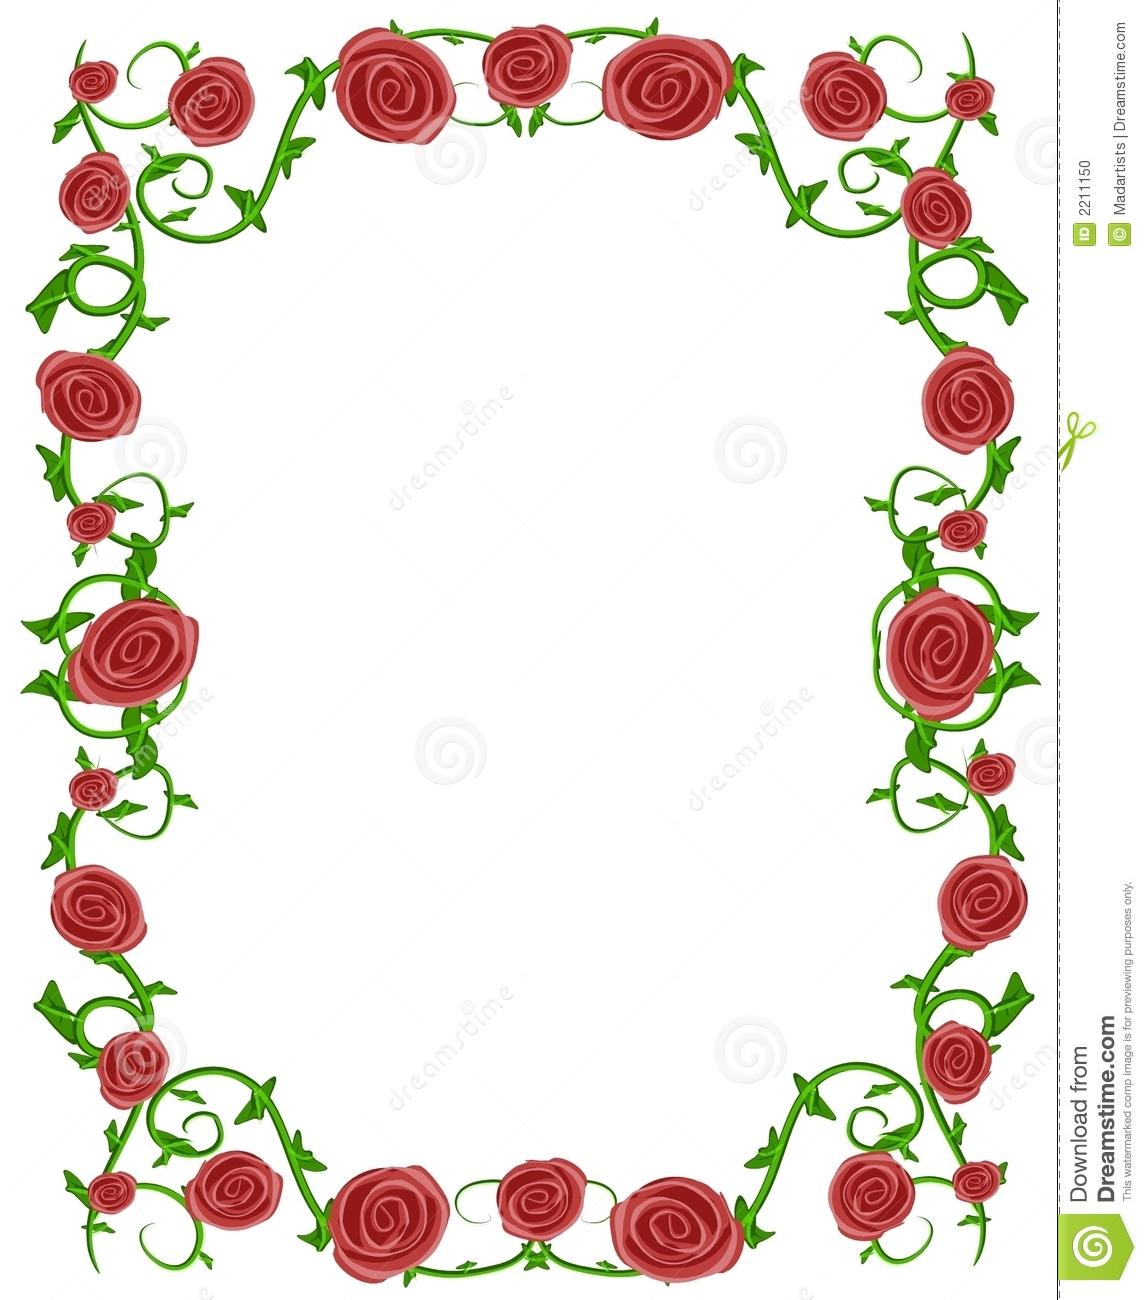 Christmas Border Clipart Free.Holiday Borders Clipart Free Download Best Holiday Borders